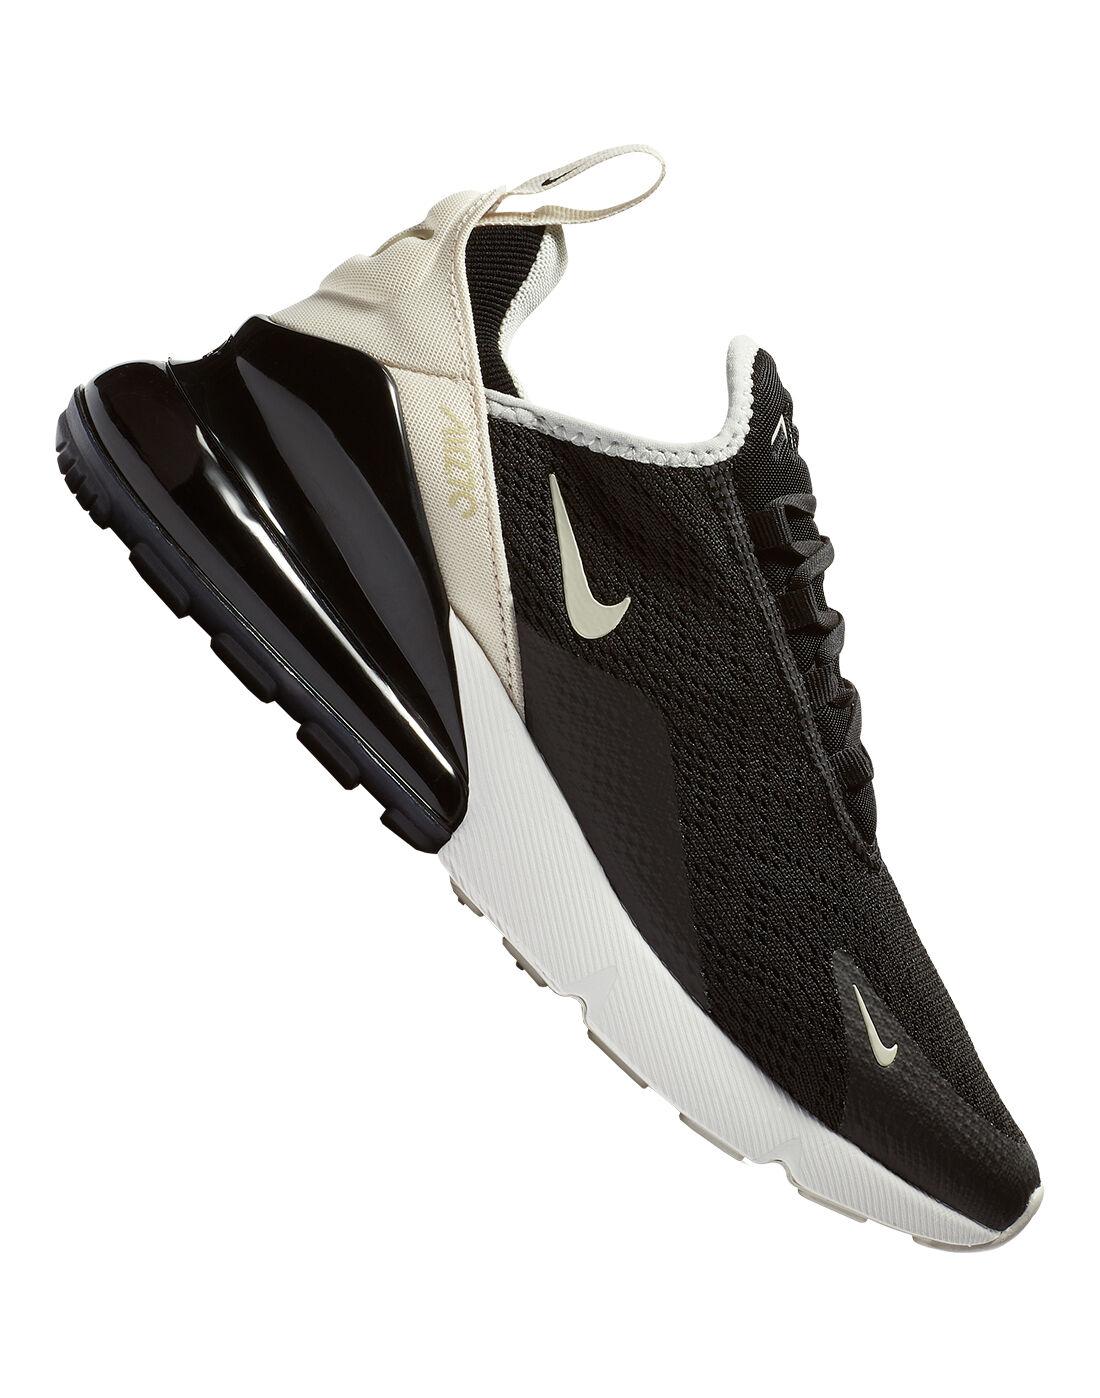 new style 52936 b6201 Nike Air Max 95 Junior Yellow Grey | Обекти